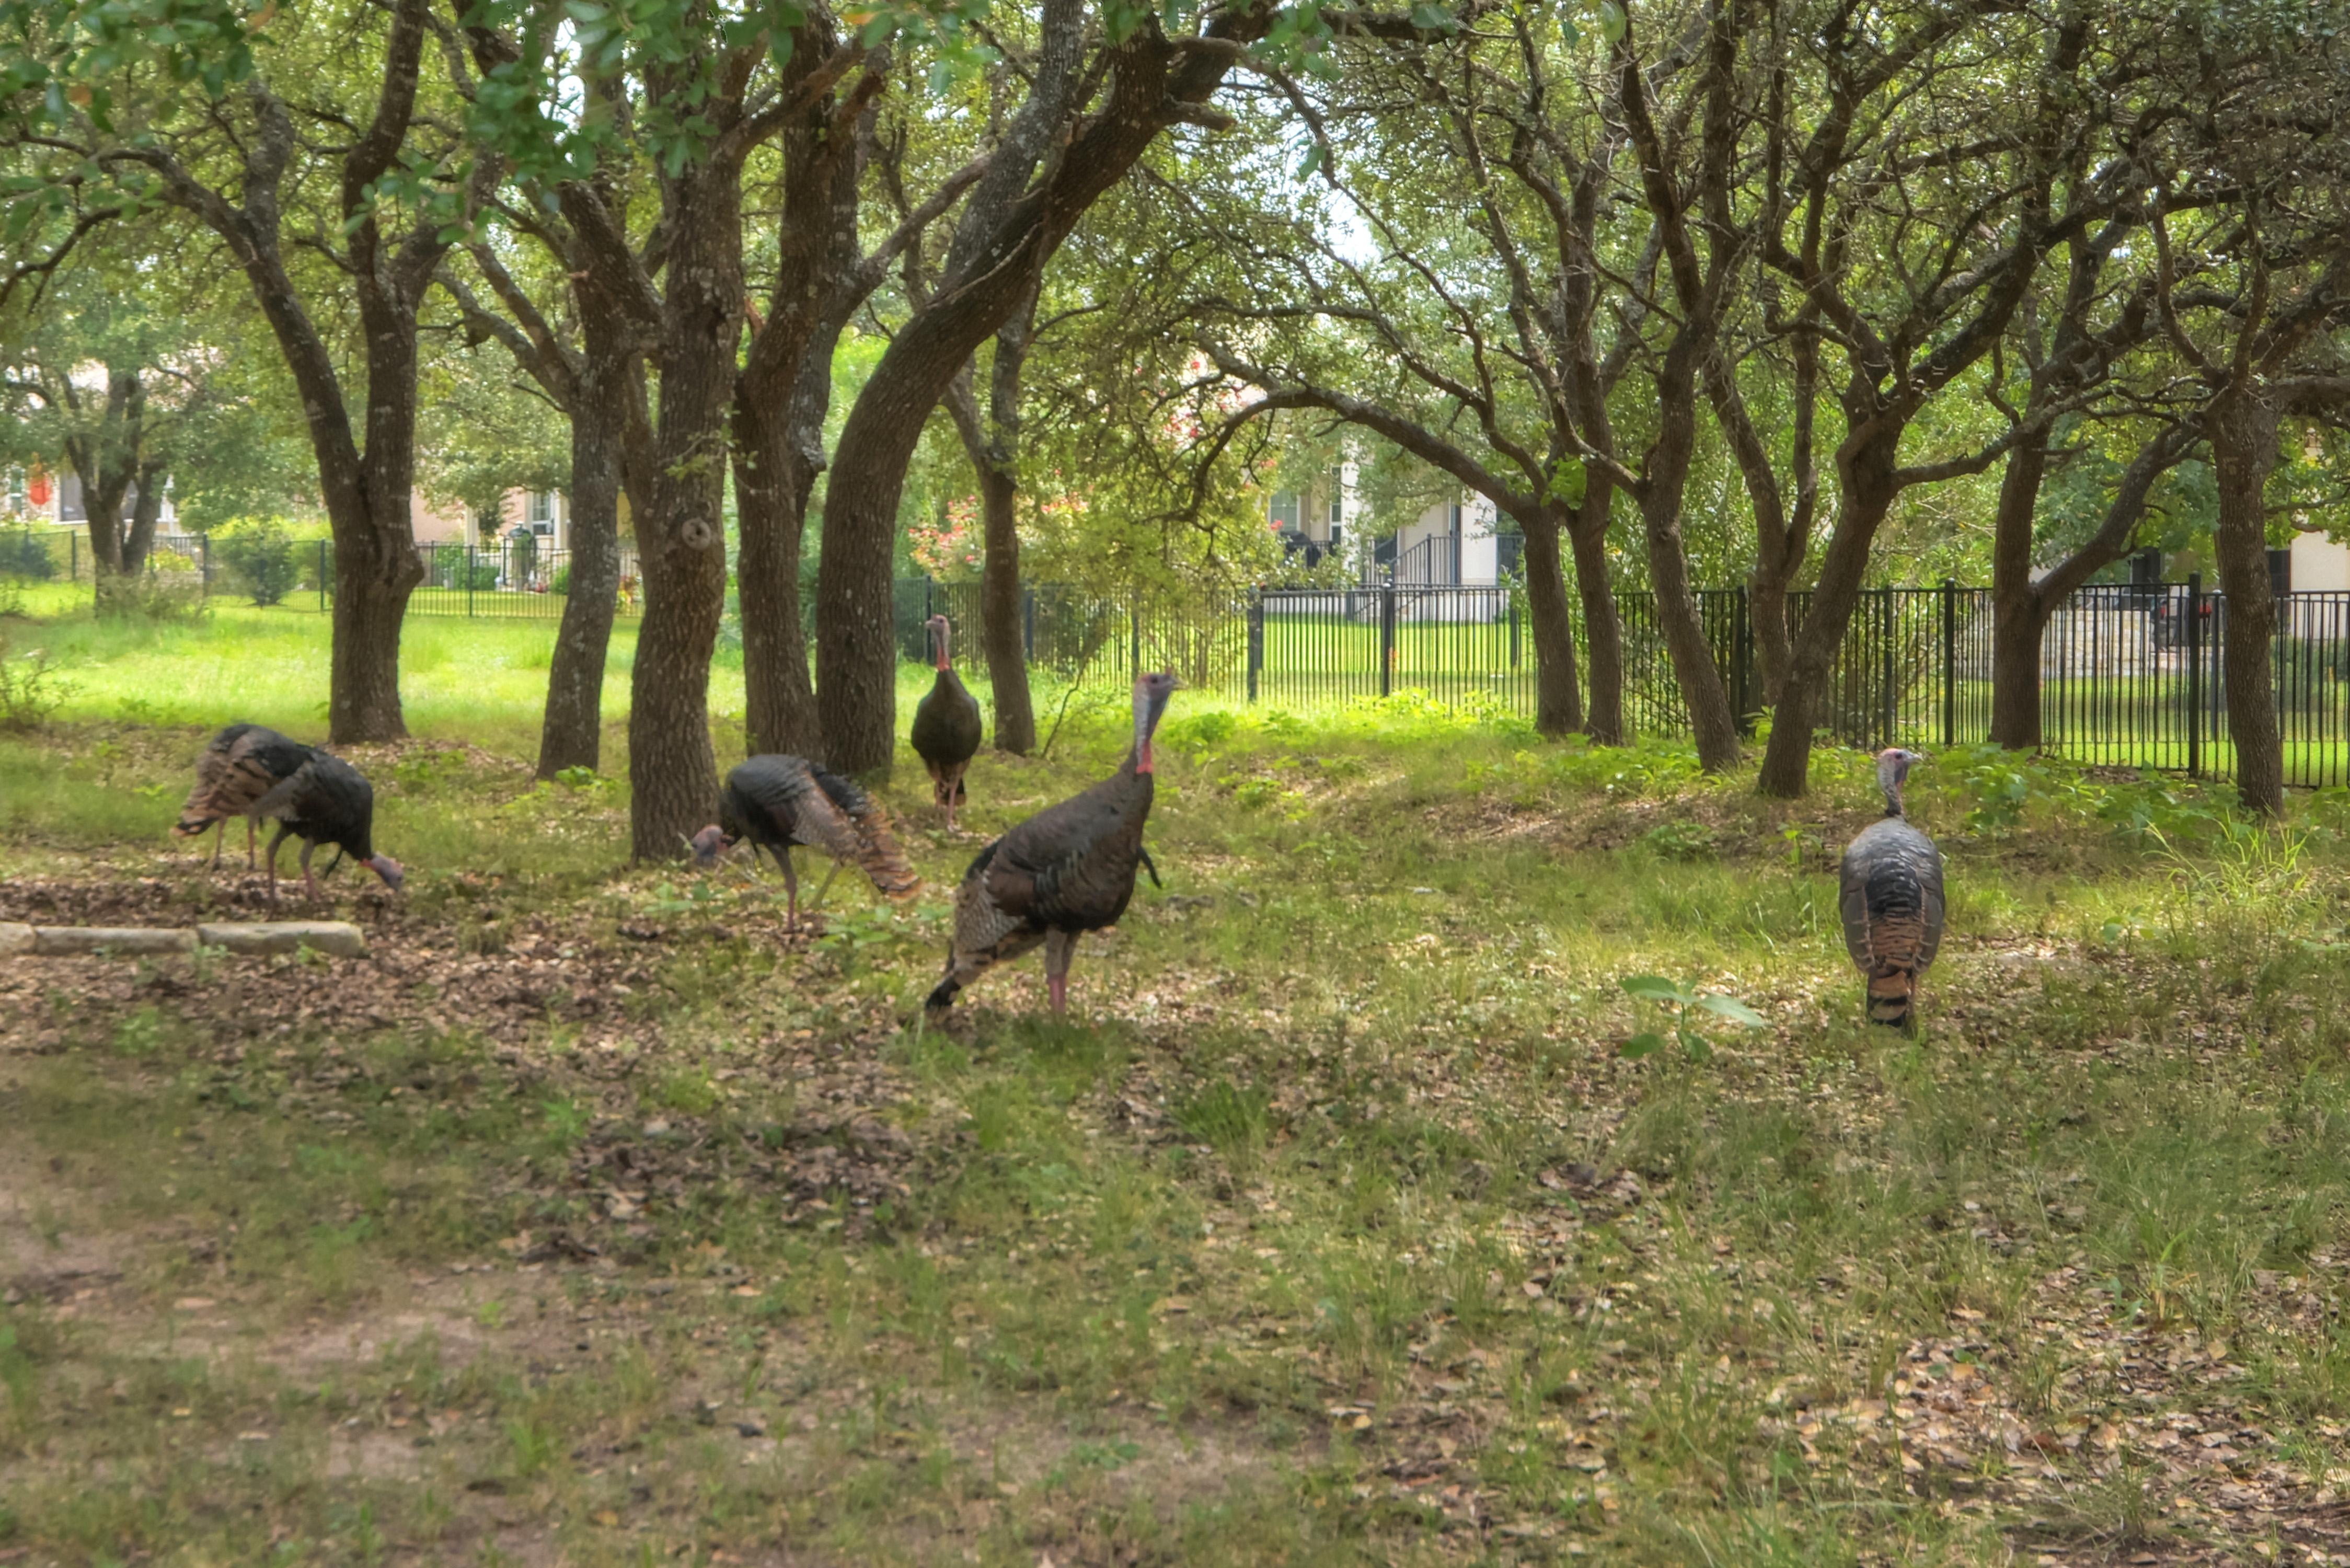 Turkeys are a normal sight in Sun City